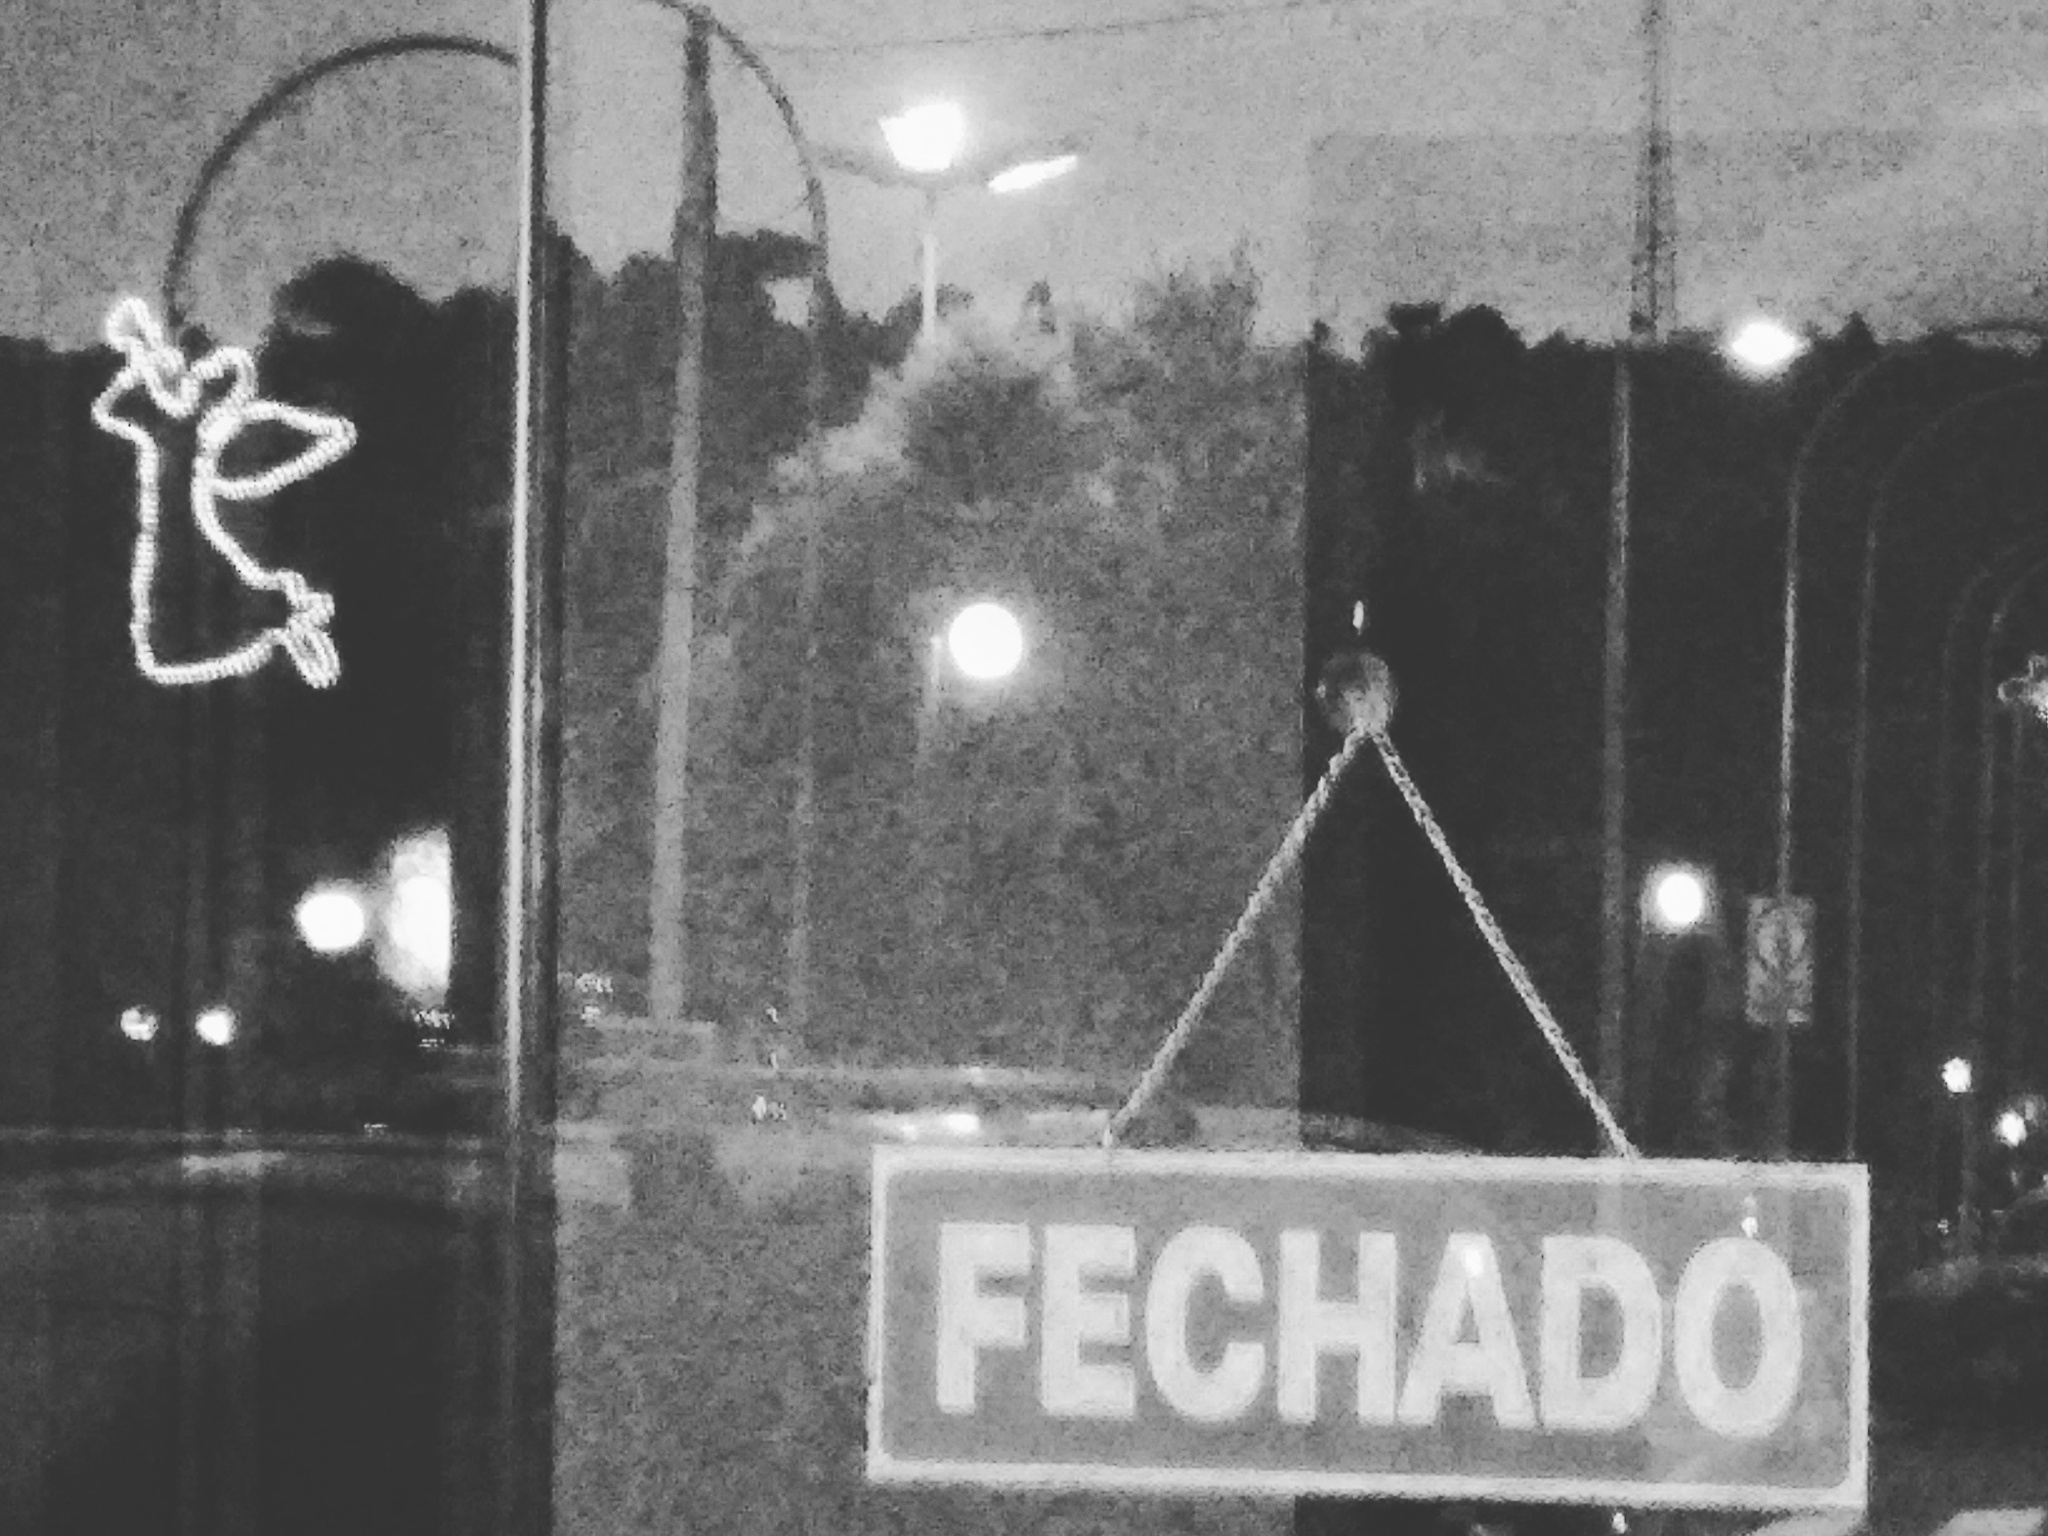 Fechado by Evelyn Postali